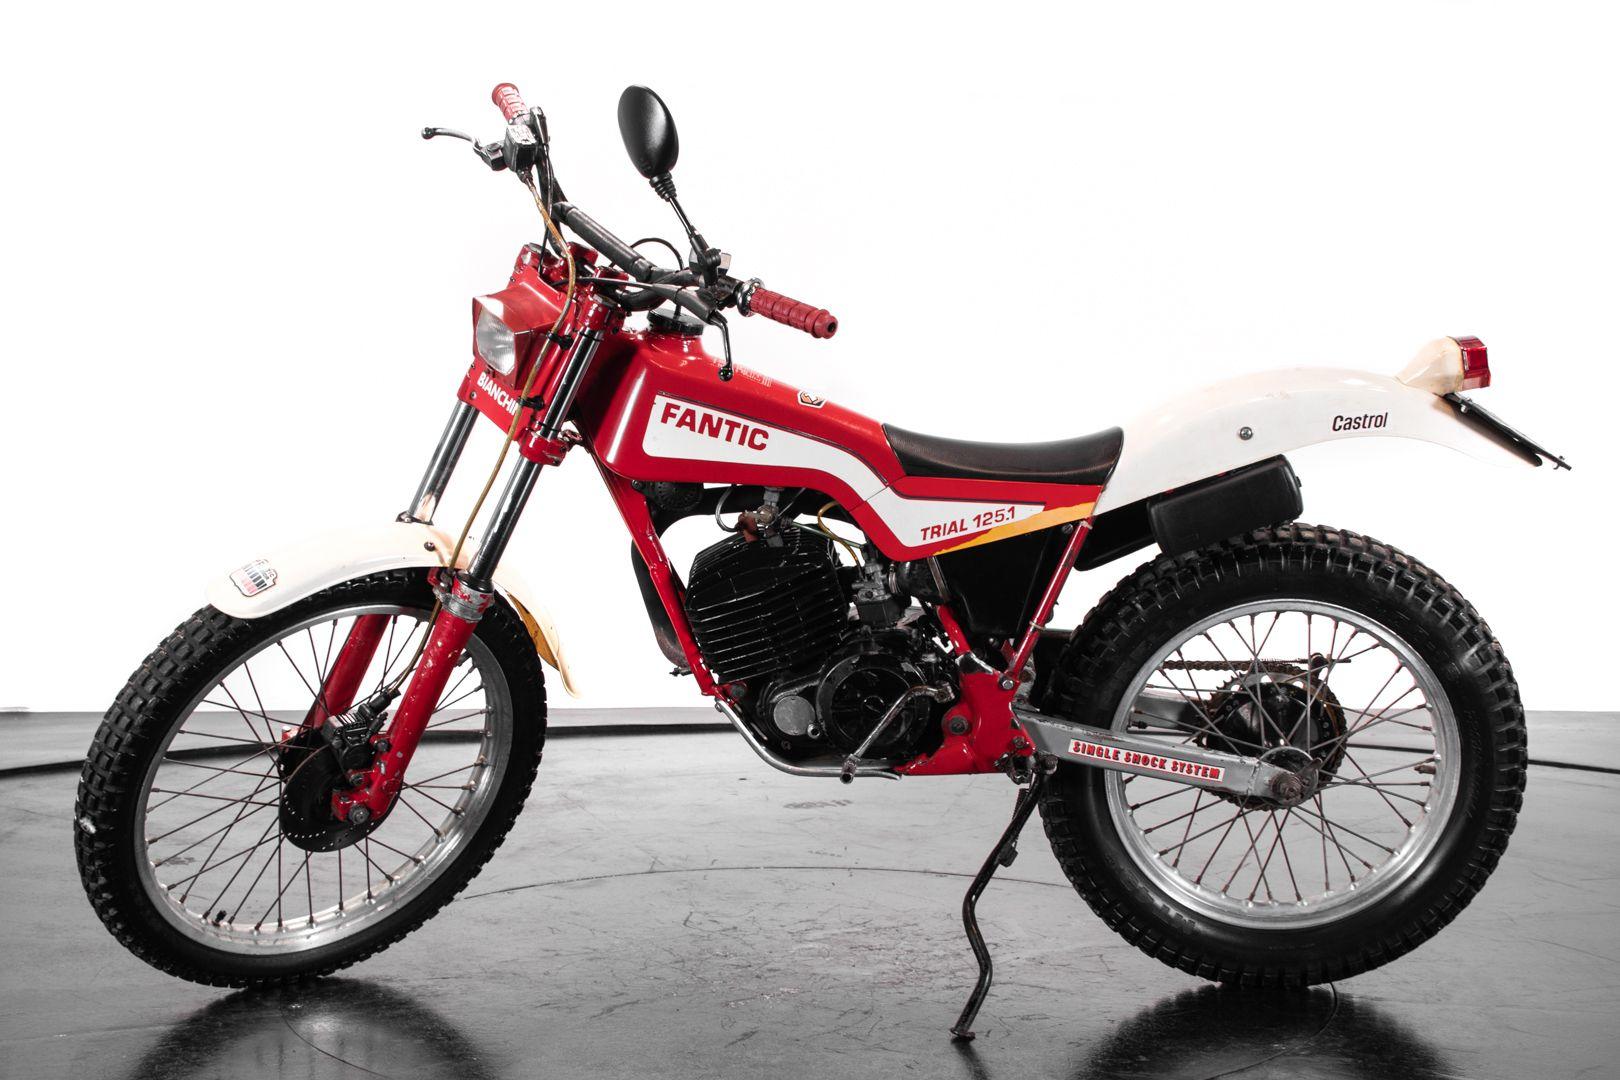 1986 Fantic Motor Trial 125 Professional 237 69032